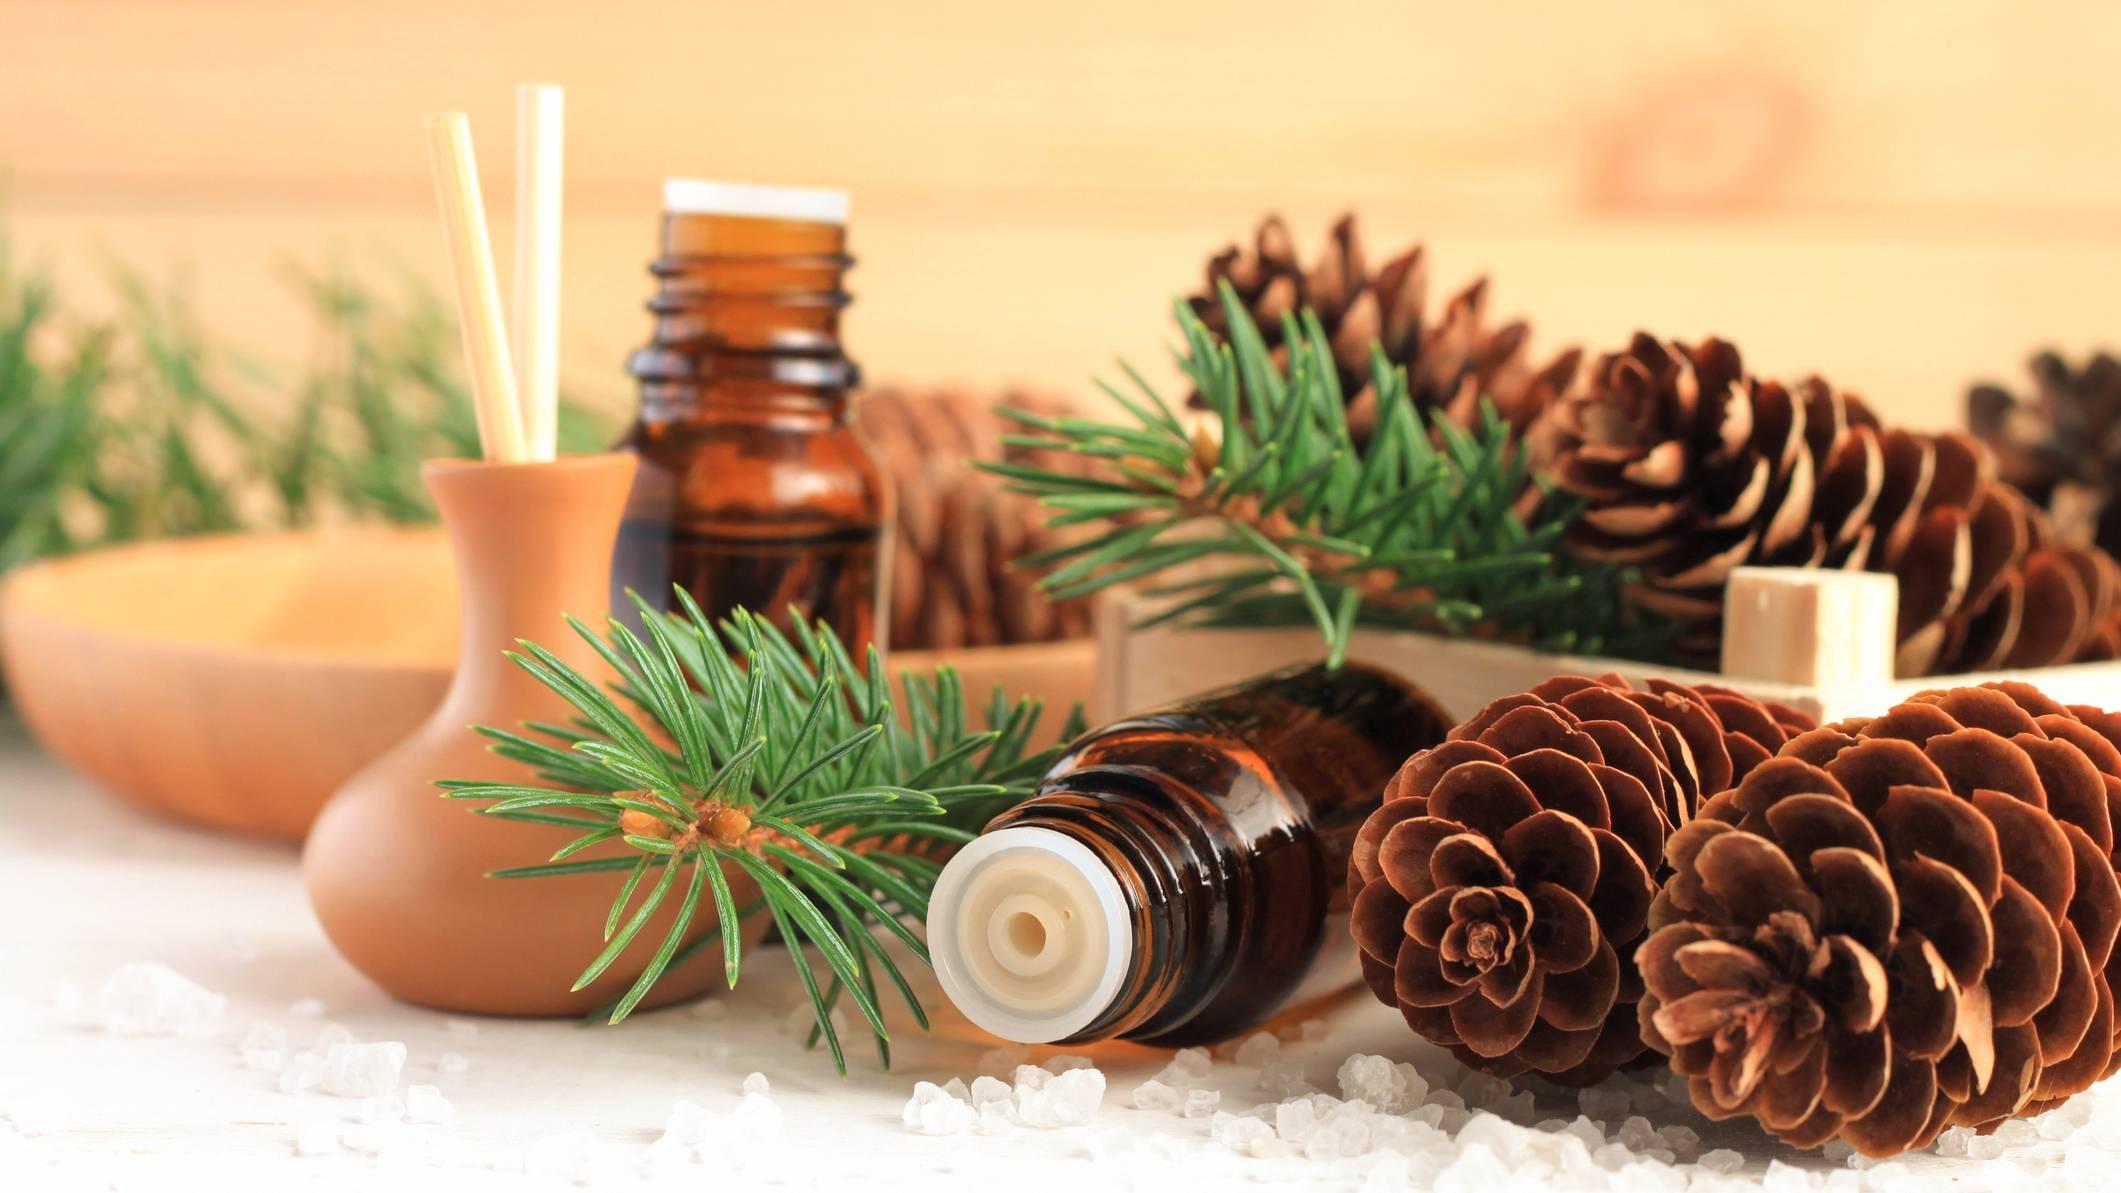 Winter Fragrance Workshop, with Alchemy Henna